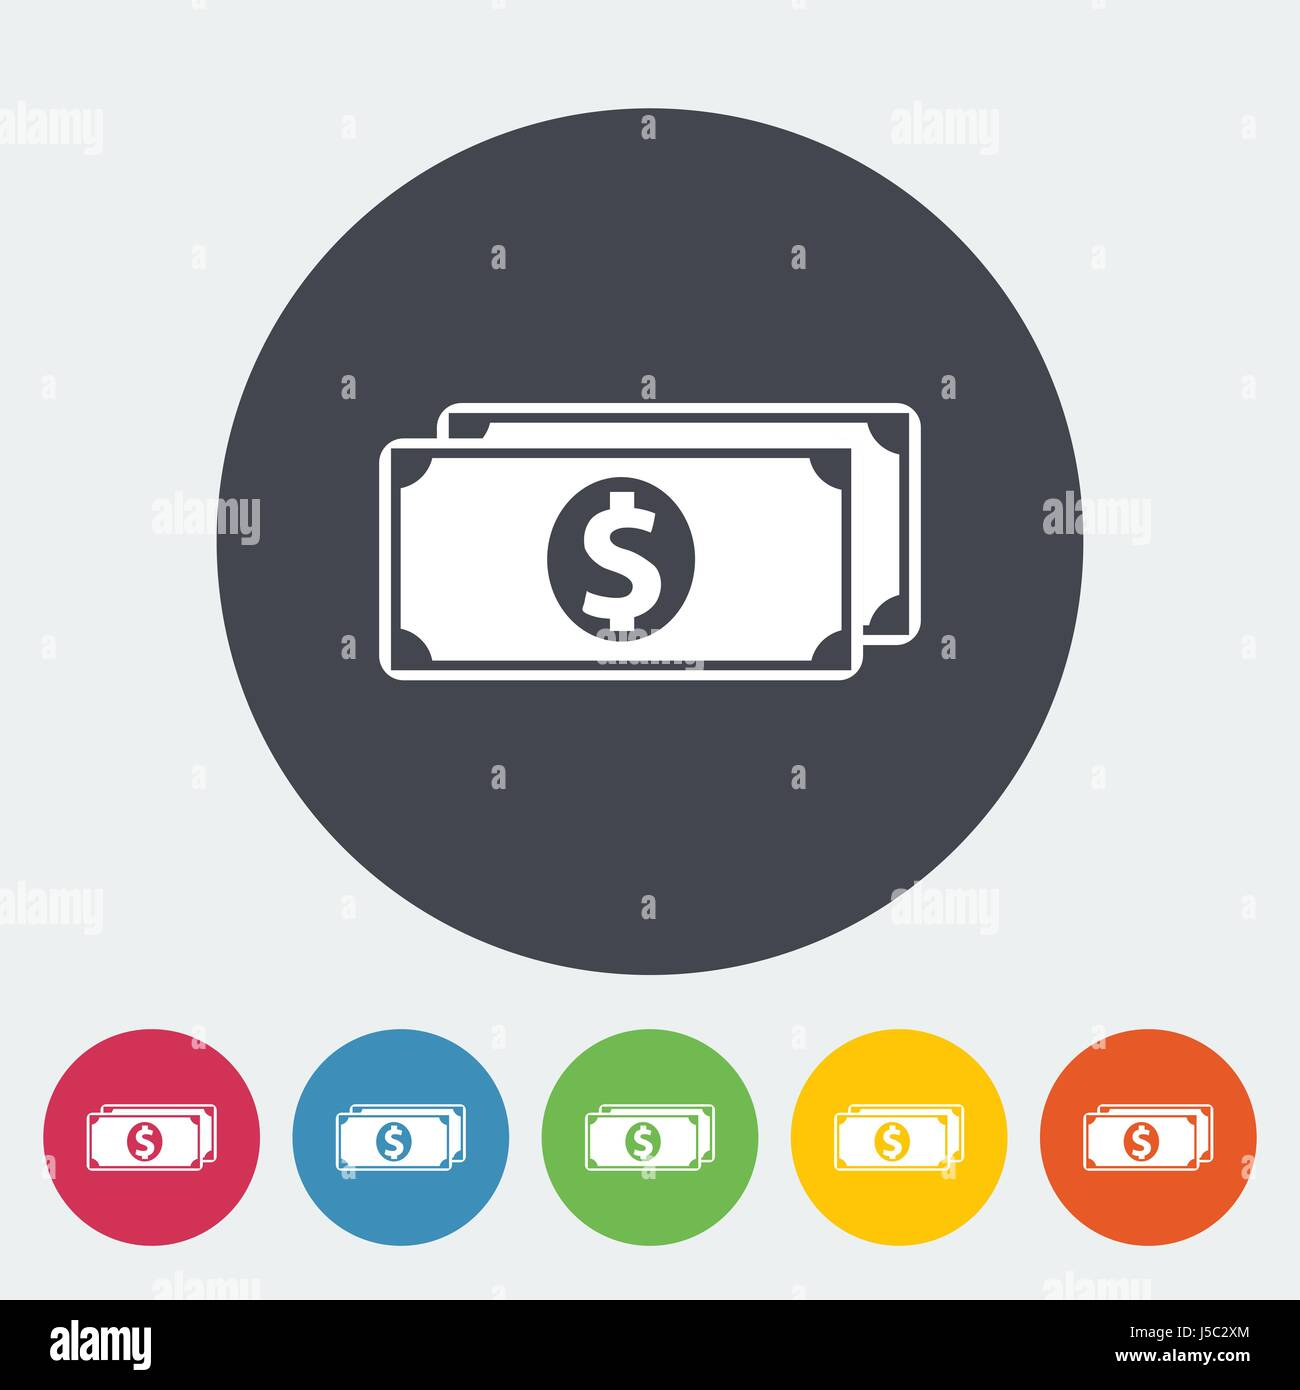 Dollar Single flat icon. Vector illustration. EPS 10 - Stock Image